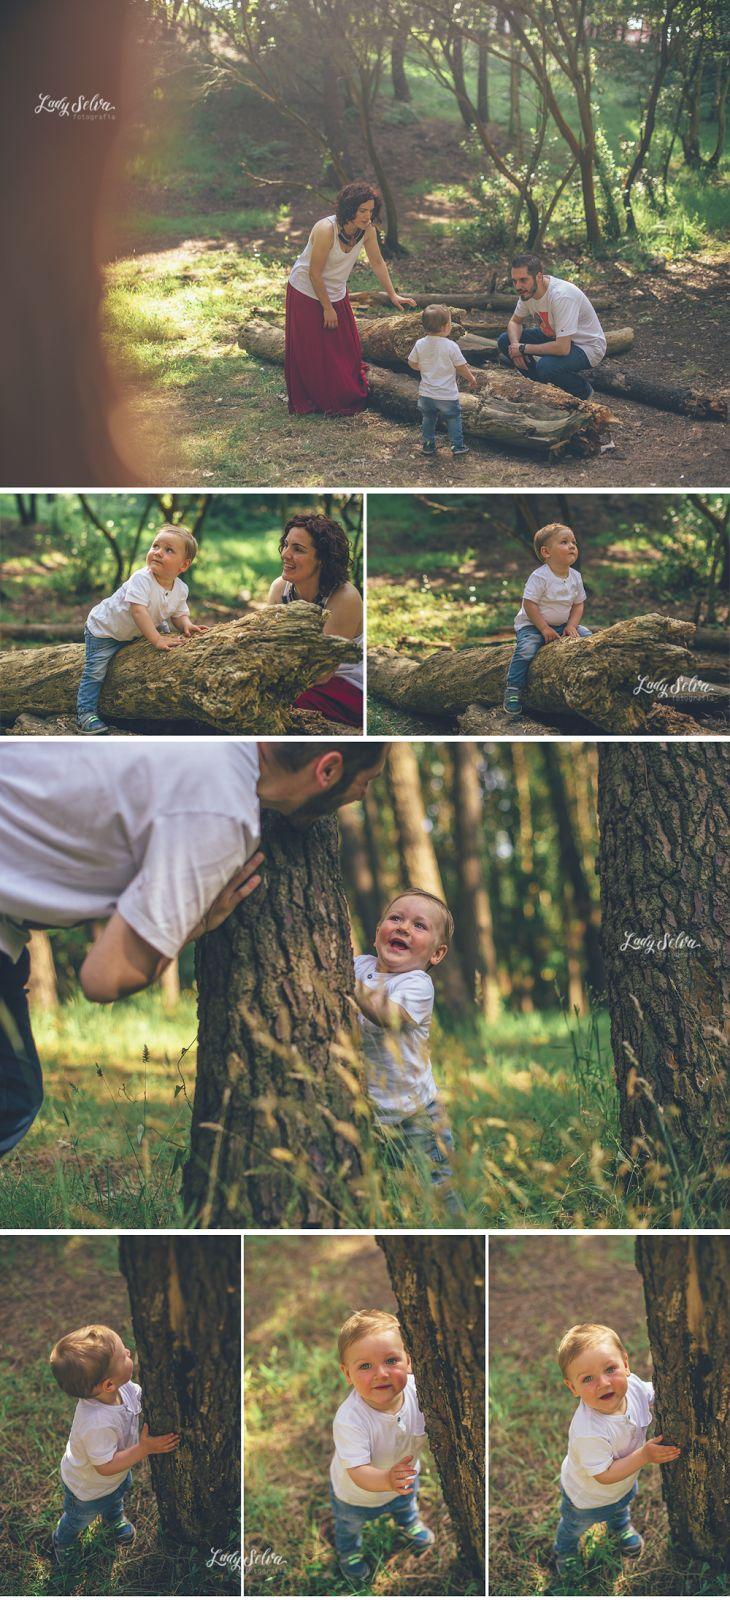 familiar. Photo Family. Asturias. Lady Selva Fotografia. Family pictures, editorial family photo shoot, family picture ideas, Inspirational Photography. Lady Selva Photography